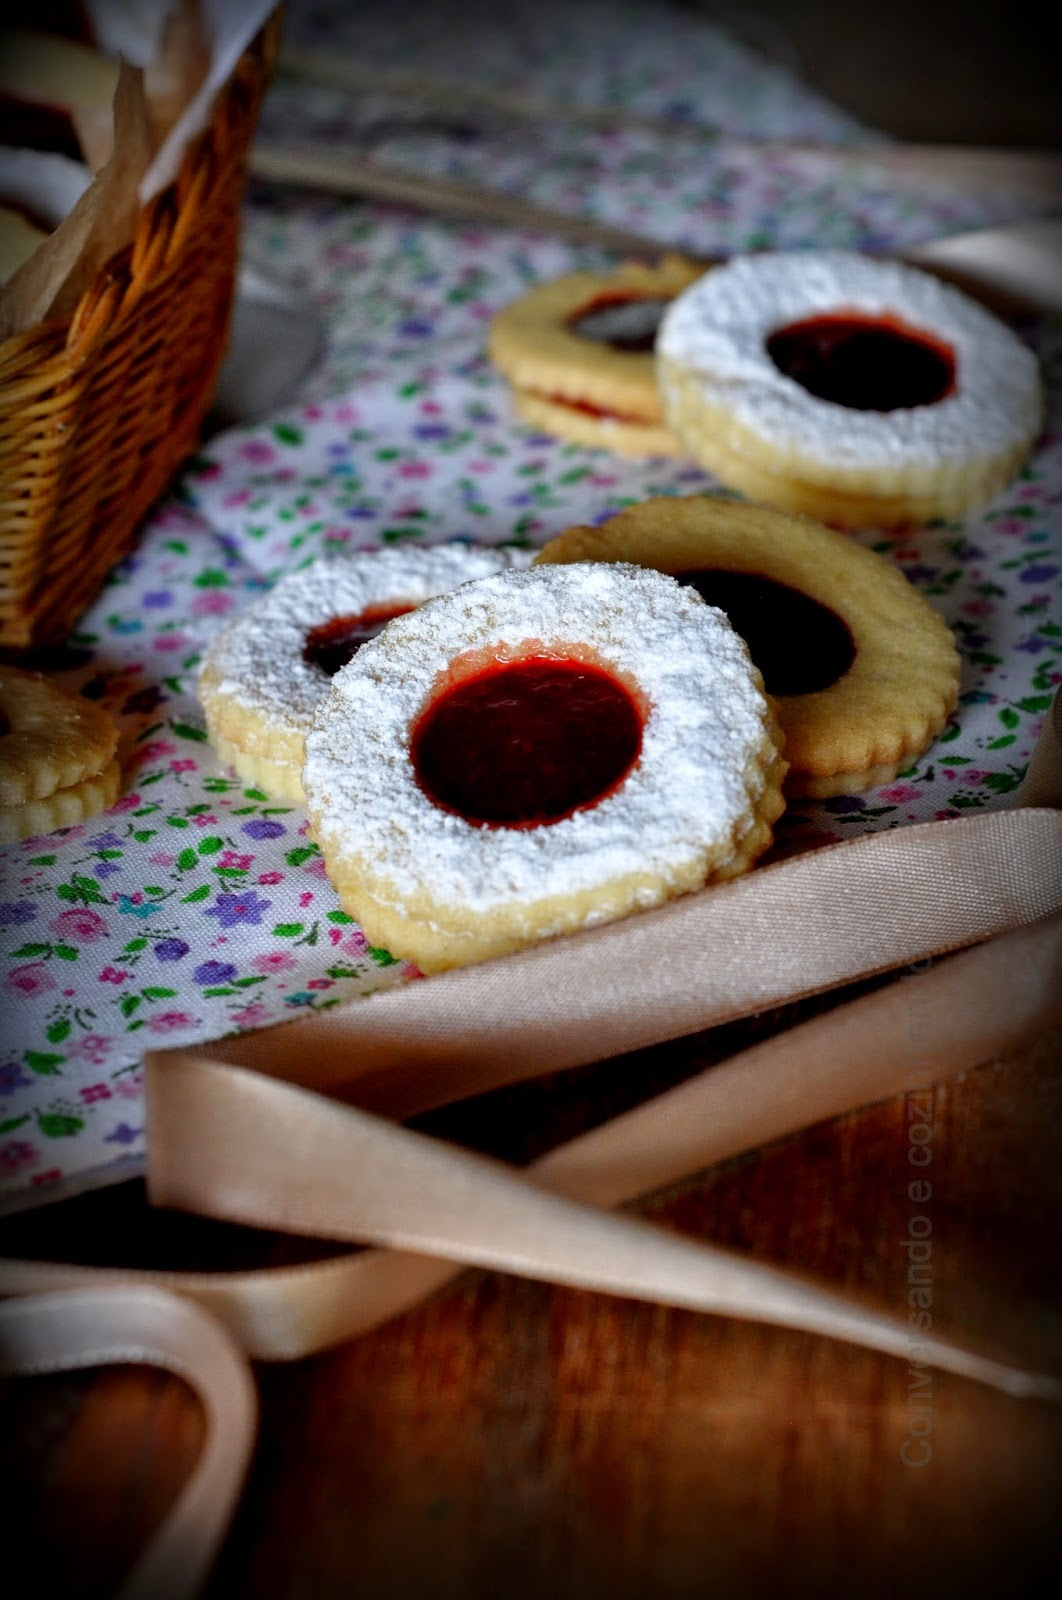 Lunetes - Biscoitinhos recheados de geléia de morango